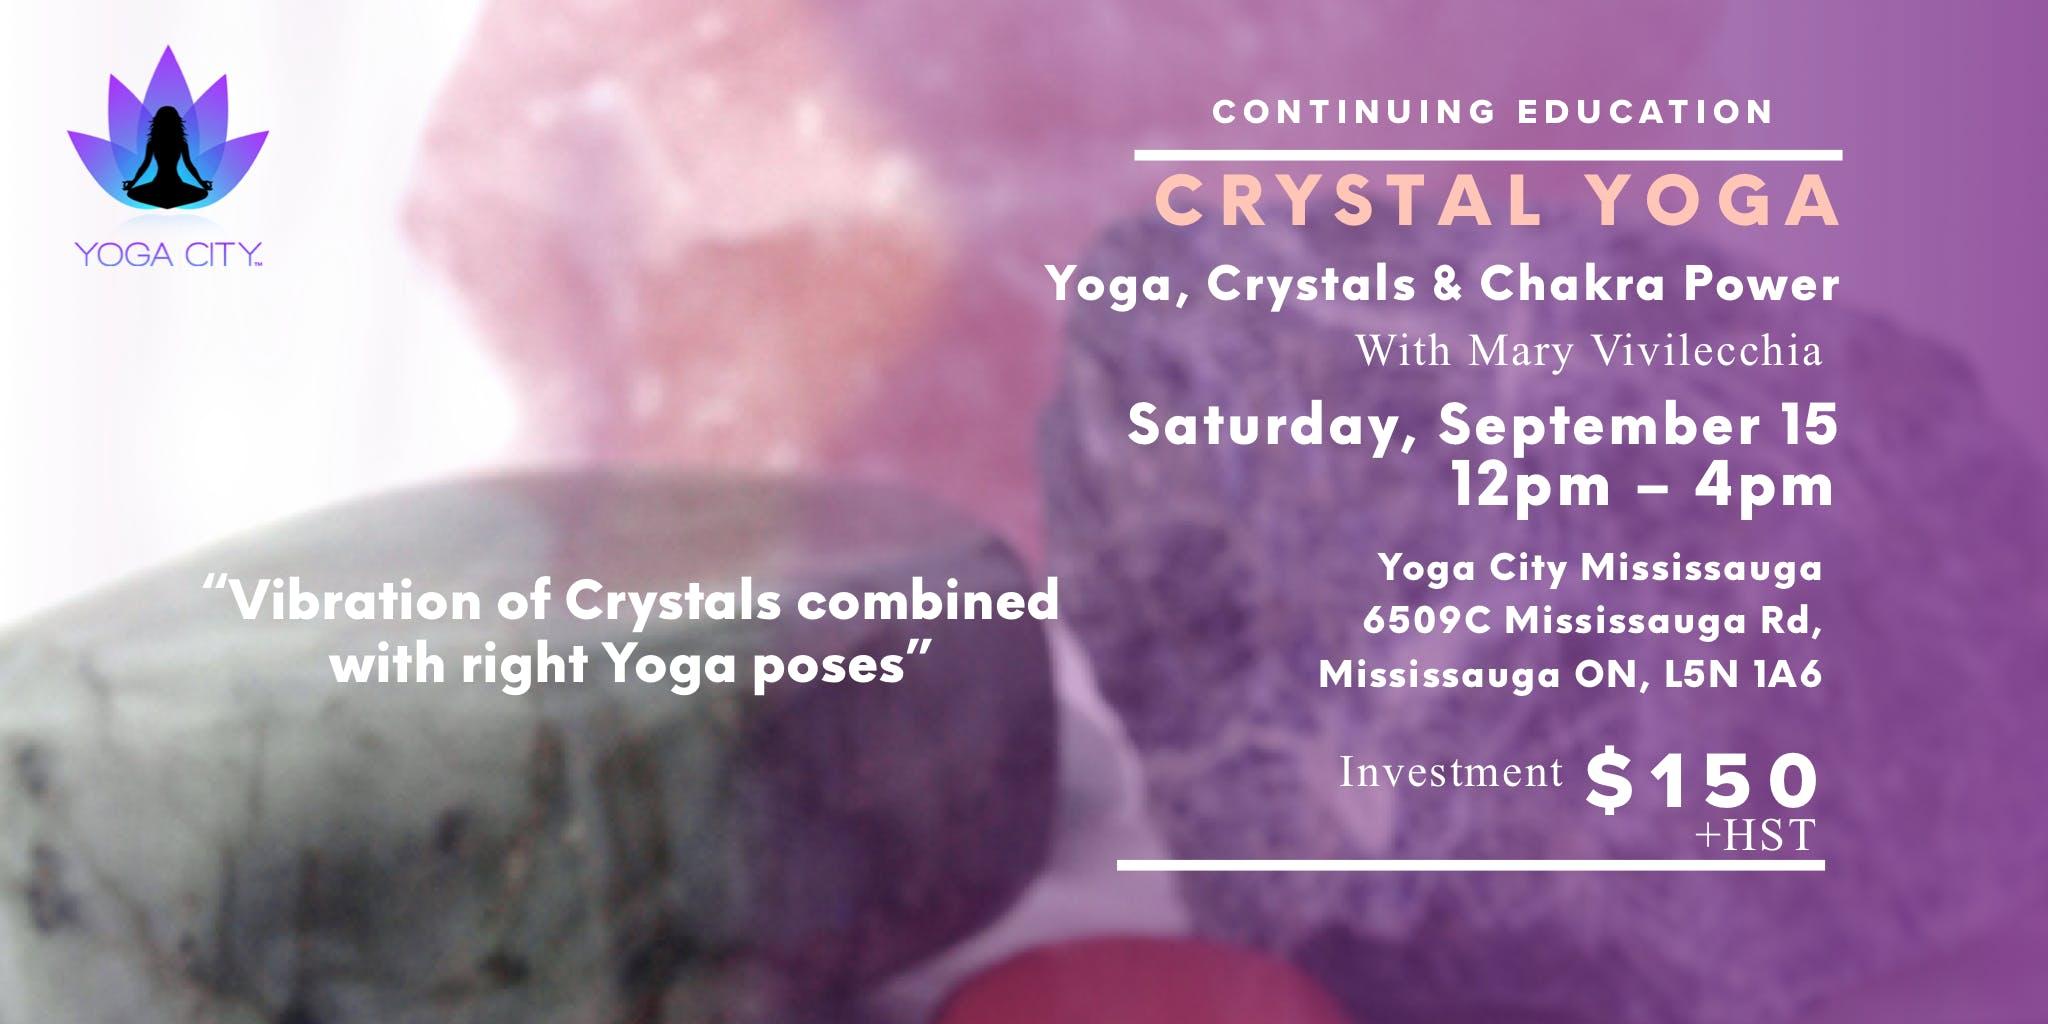 Crystal Yoga Program Yoga Crystals and Chakra Power